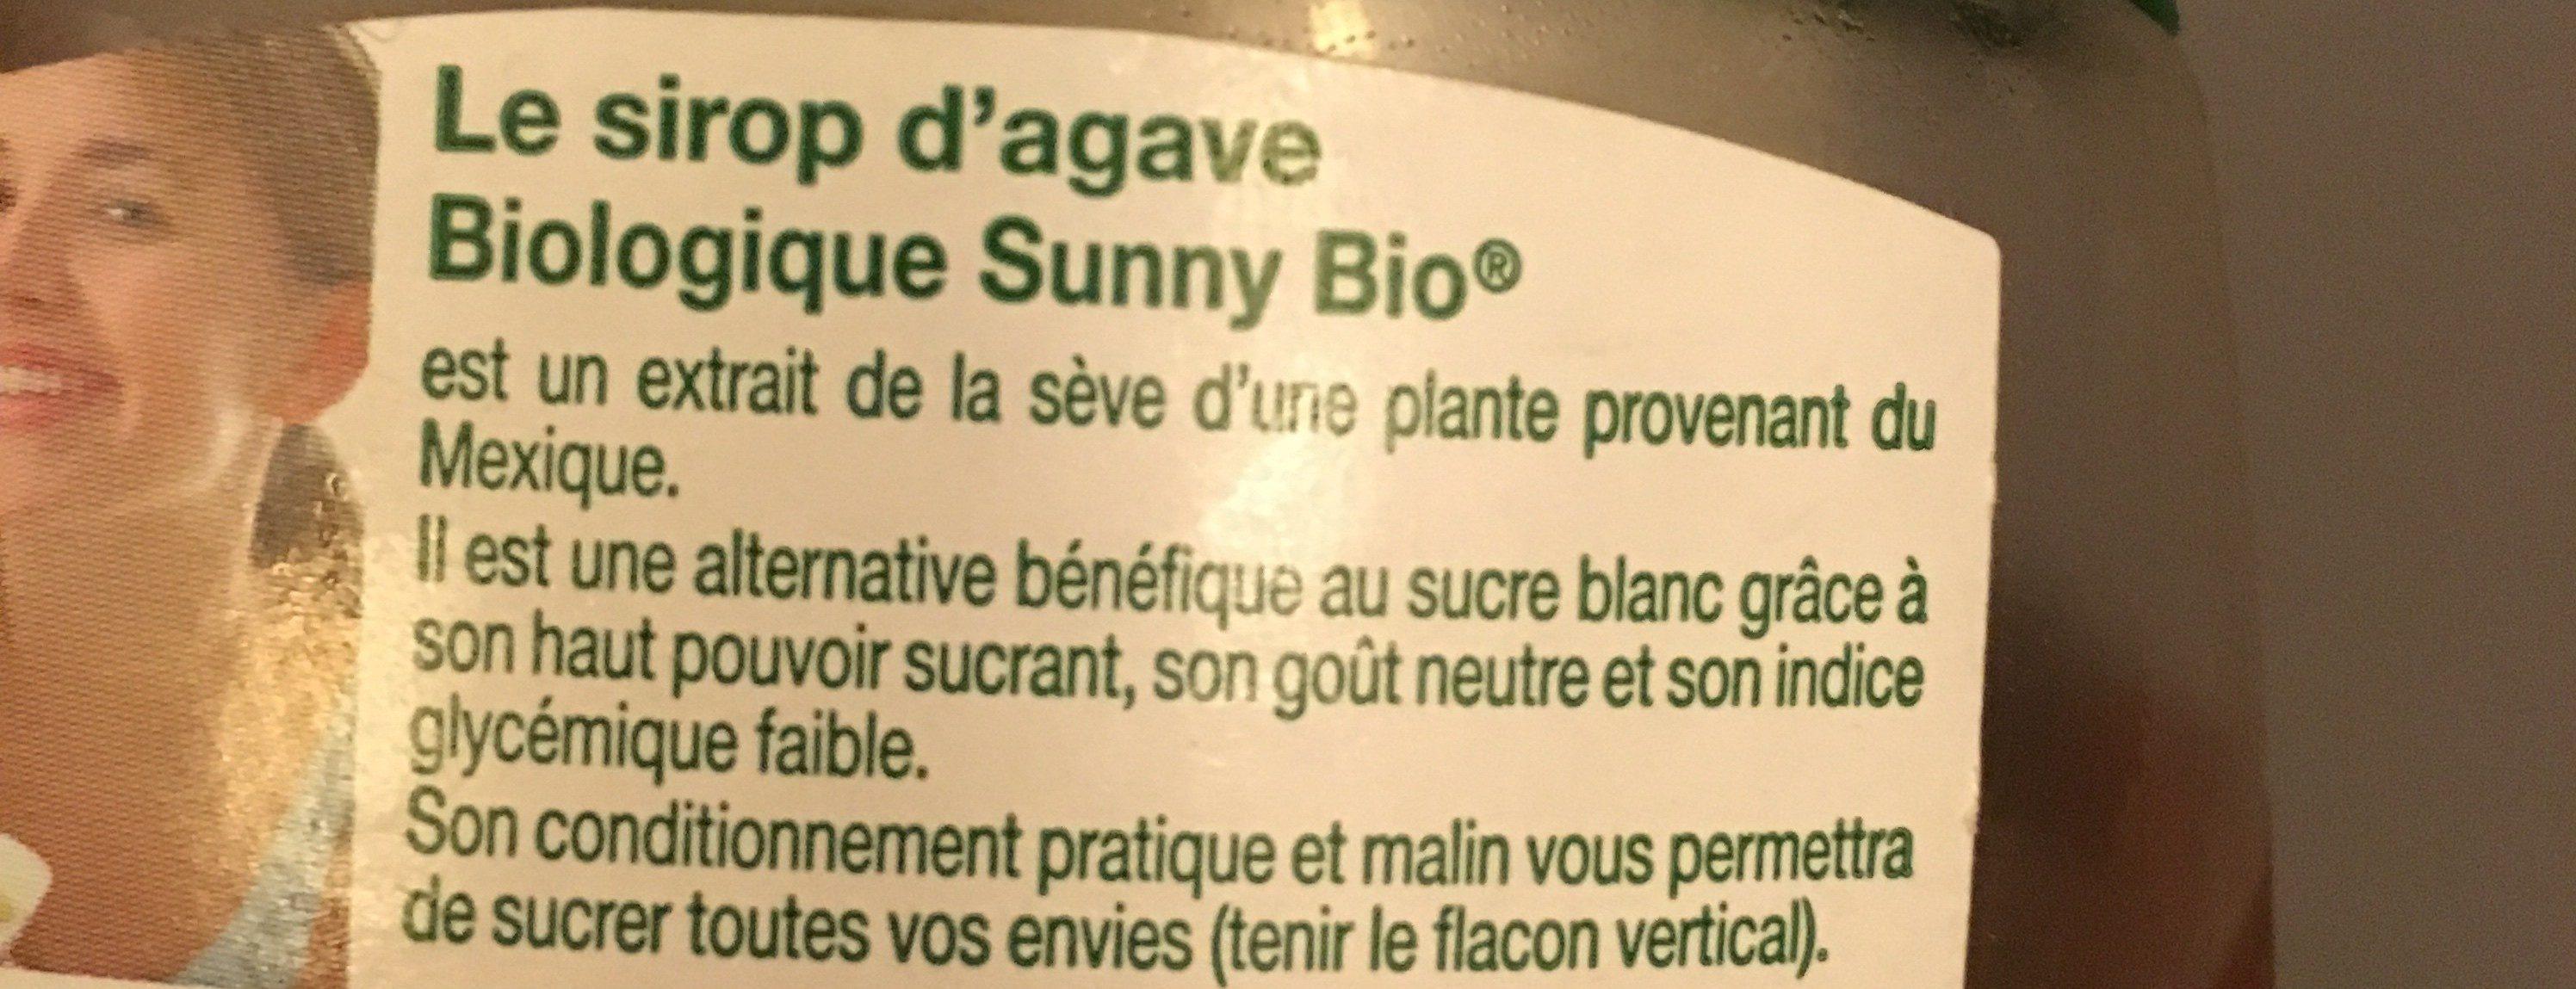 Sirop d'agave - Ingrédients